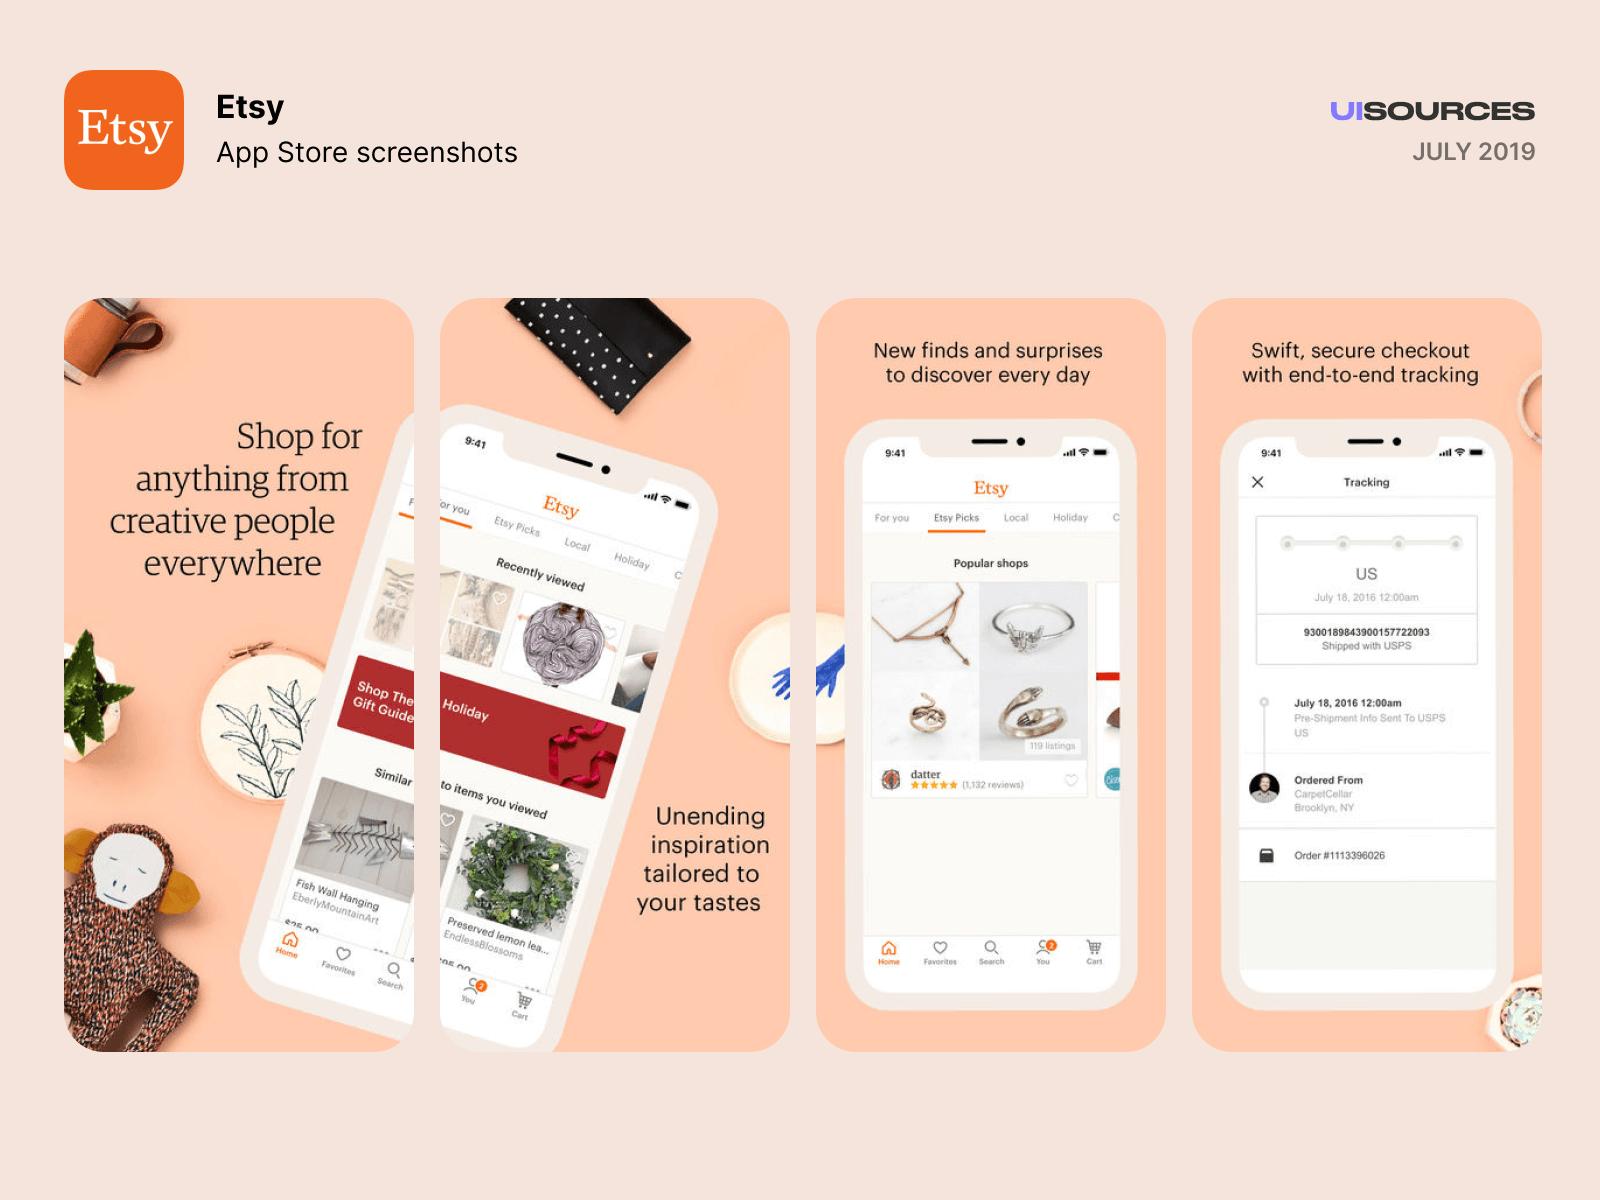 Etsy - App Store Screenshots Screenshots | UI Sources